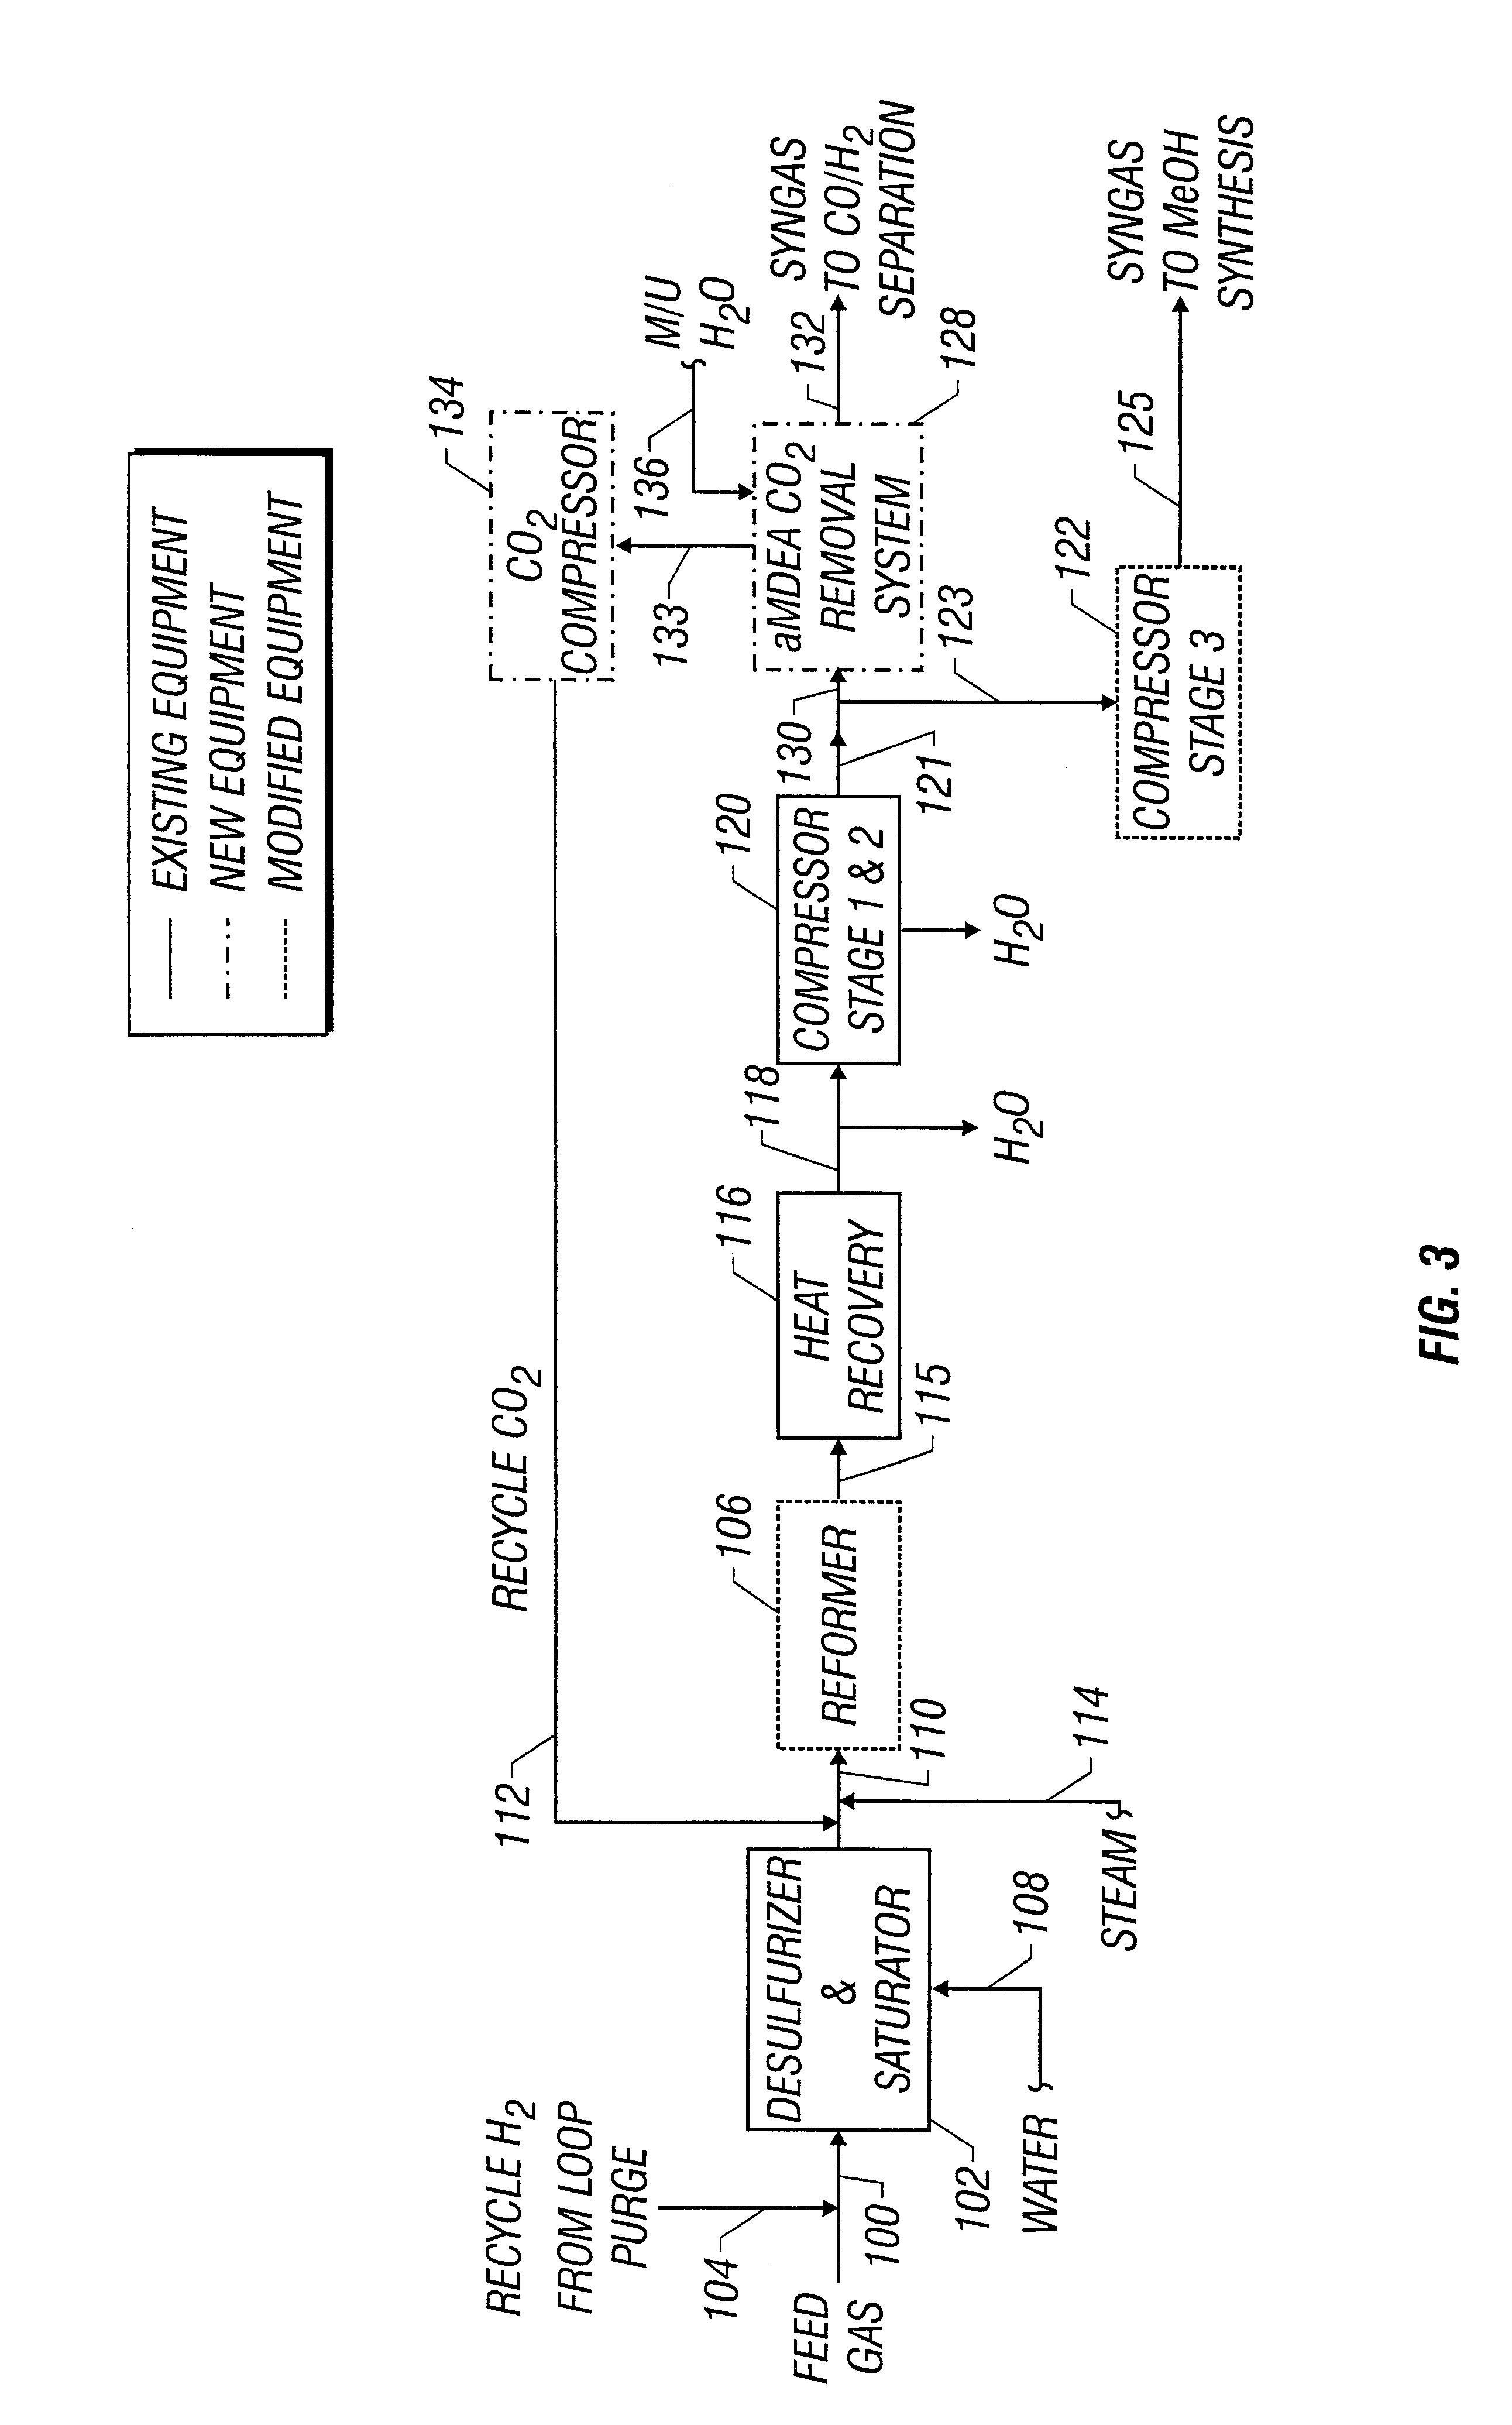 patent us6353133 - methanol plant retrofit